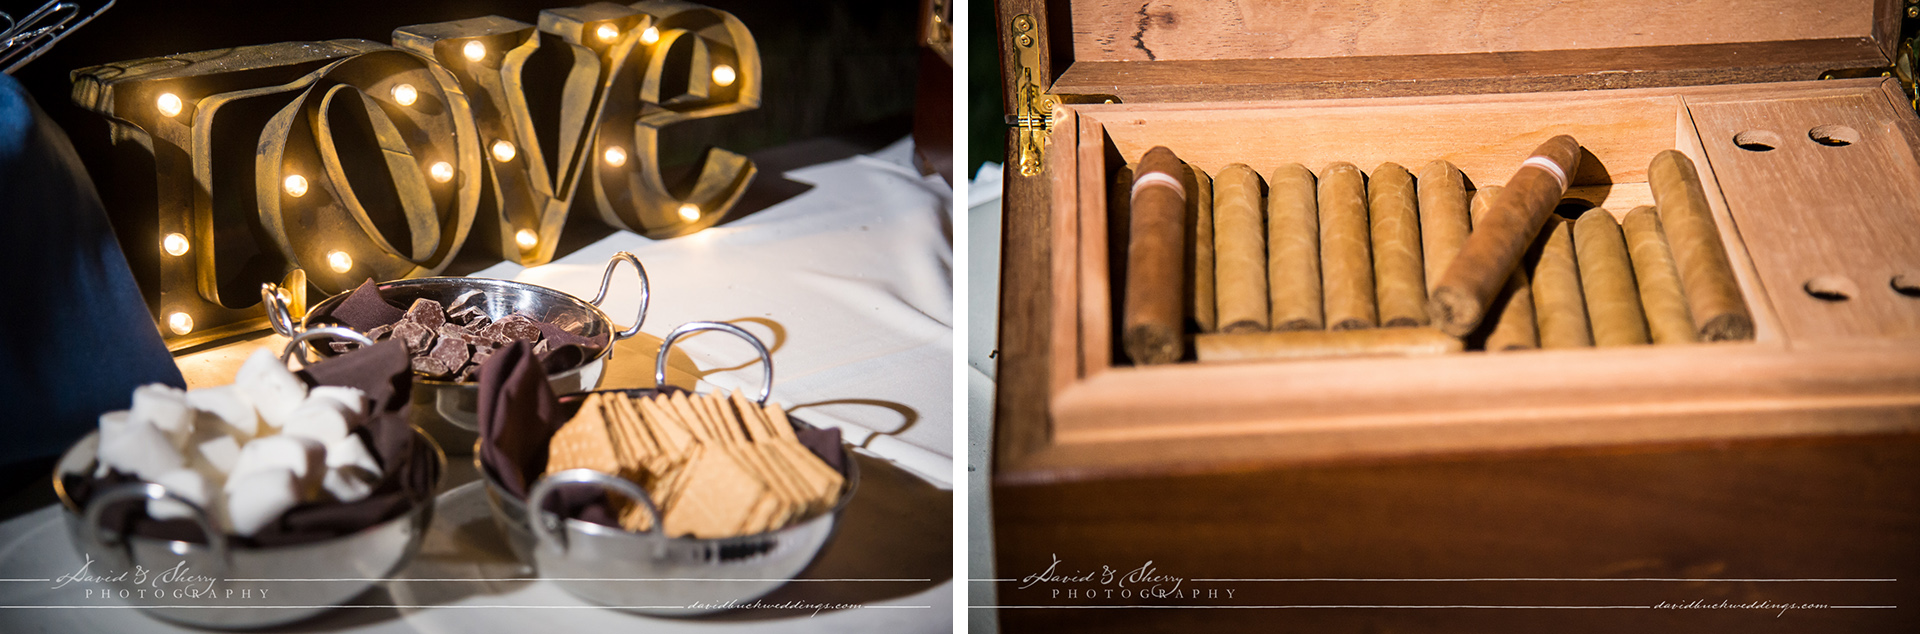 Cobble_Beach_Wedding_Photography_35